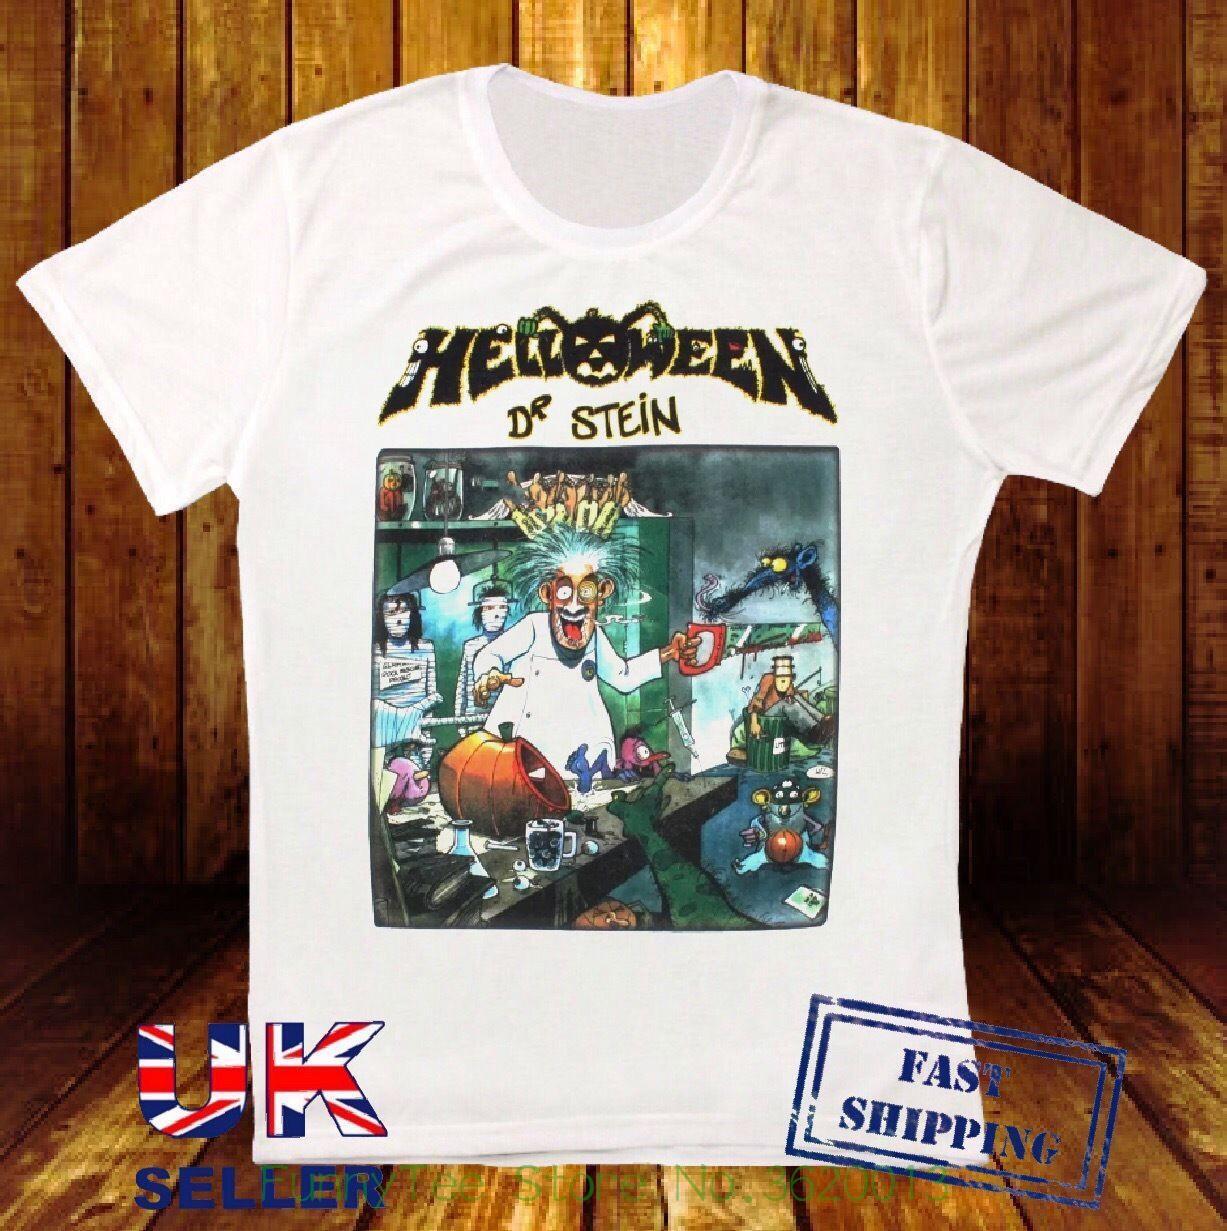 Rage Shirt Masterplan T 259 88 Iron ; Ray Saviour Gamma Dr Helloween stein Blanc QCrstdxhB